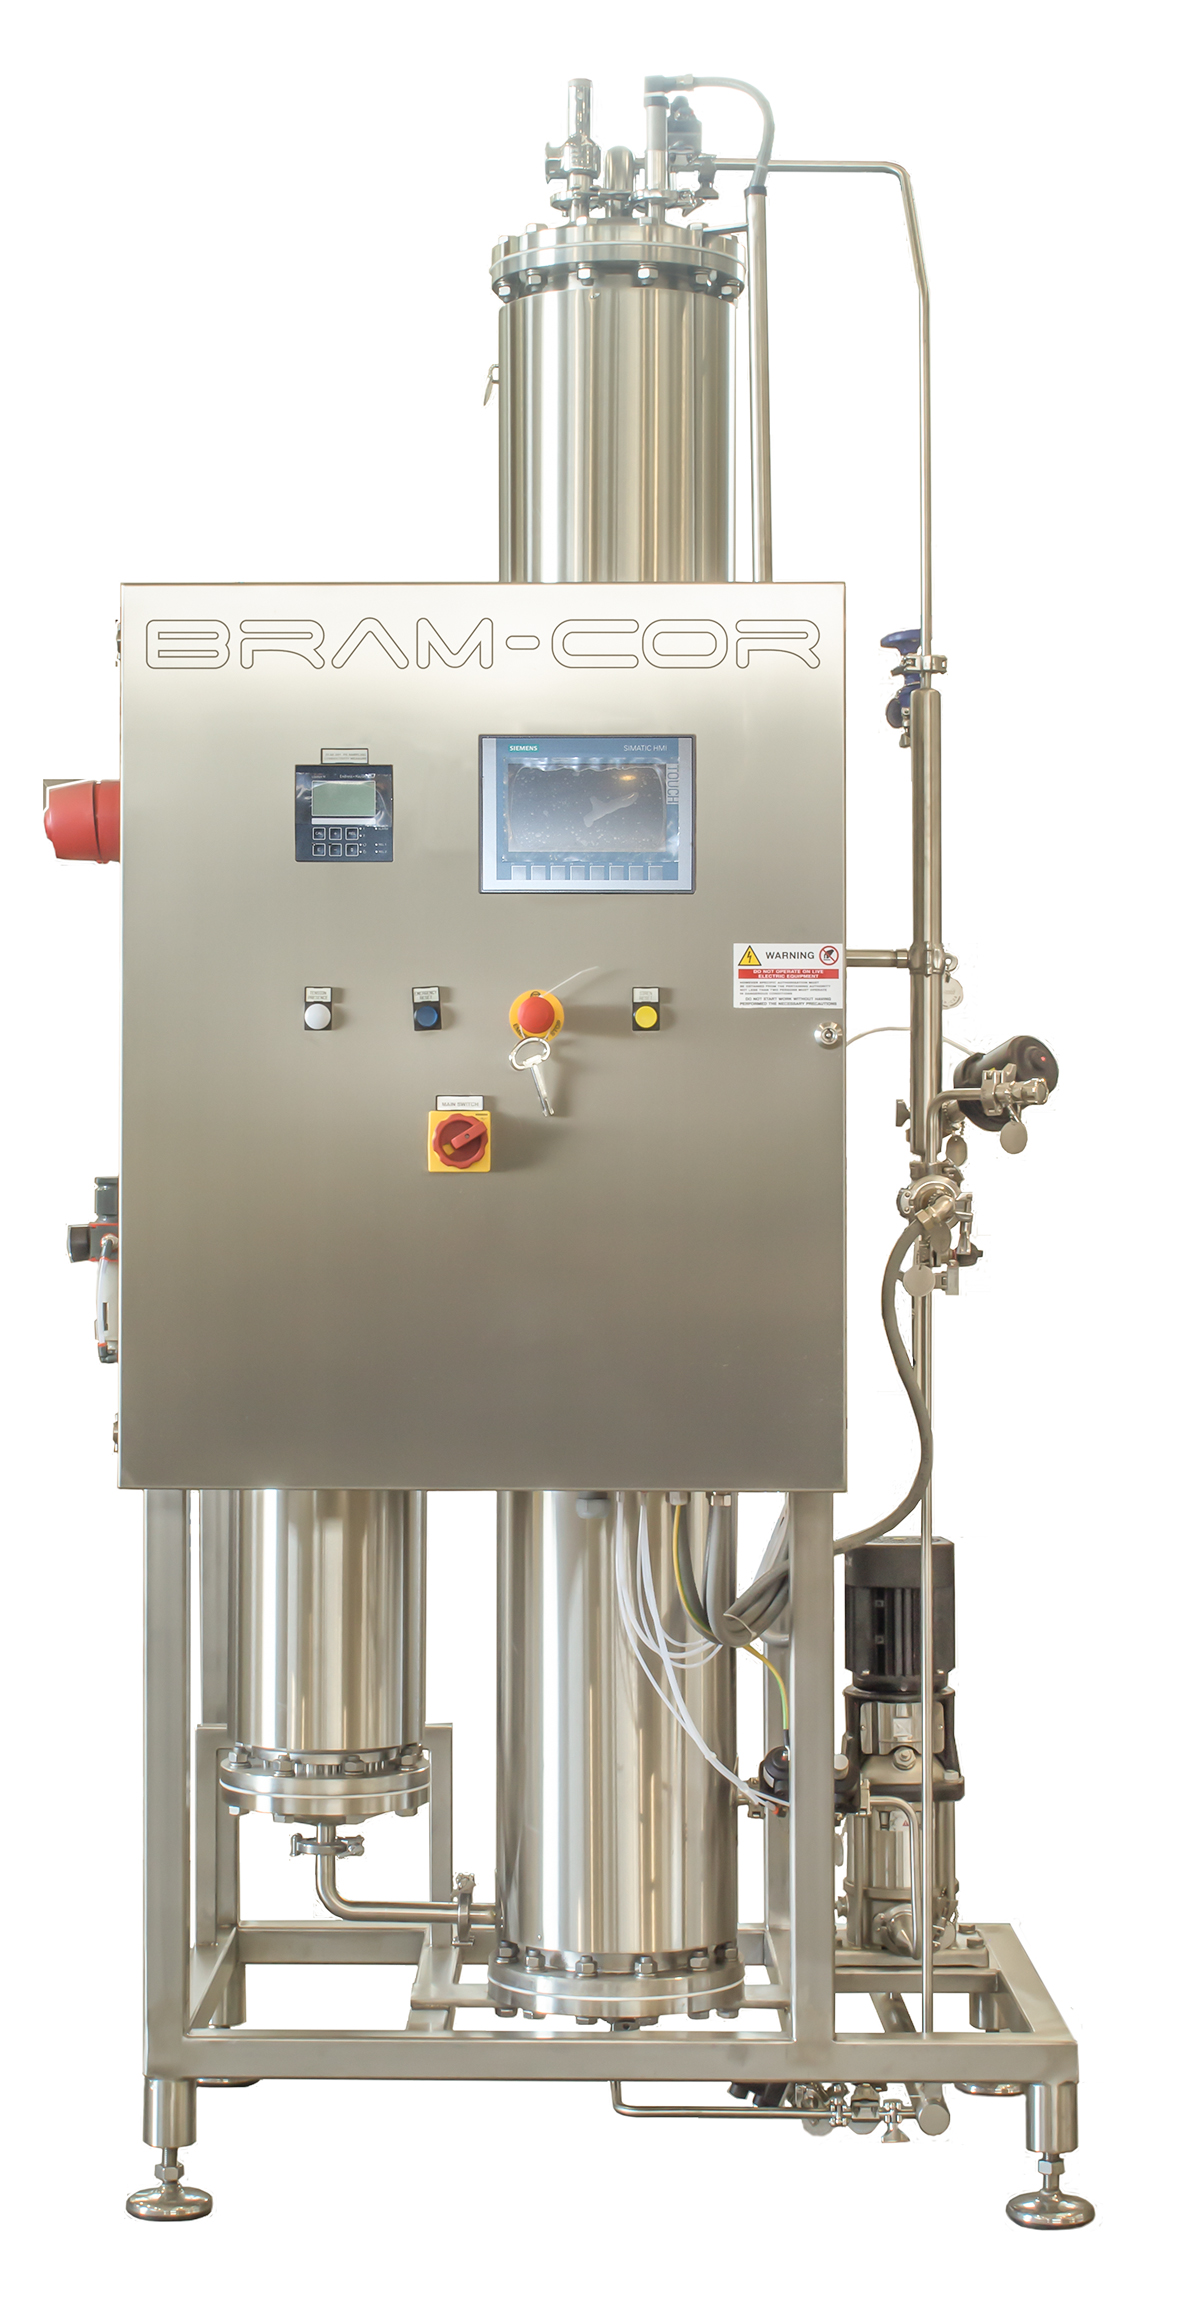 Bram Cor Pharmaceutical Equipment CPSG Pure Steam Generator